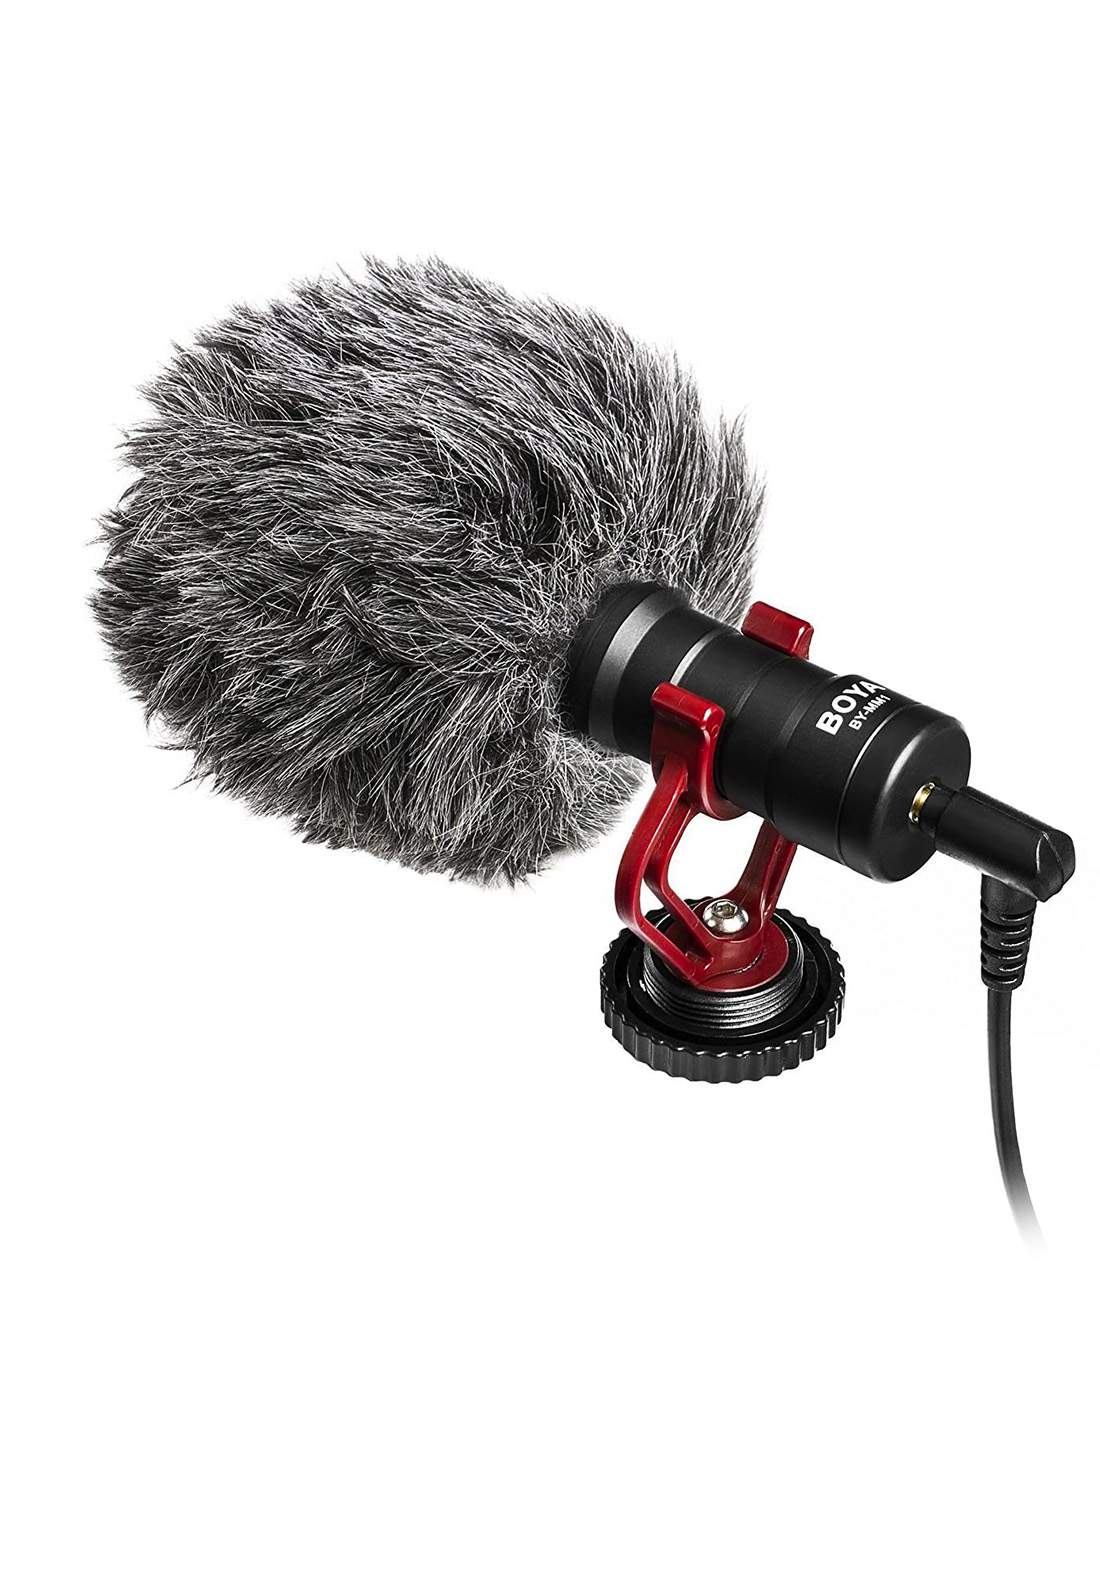 BOYA BY-MM1 Cardioid Microphone - Black مايكرفون